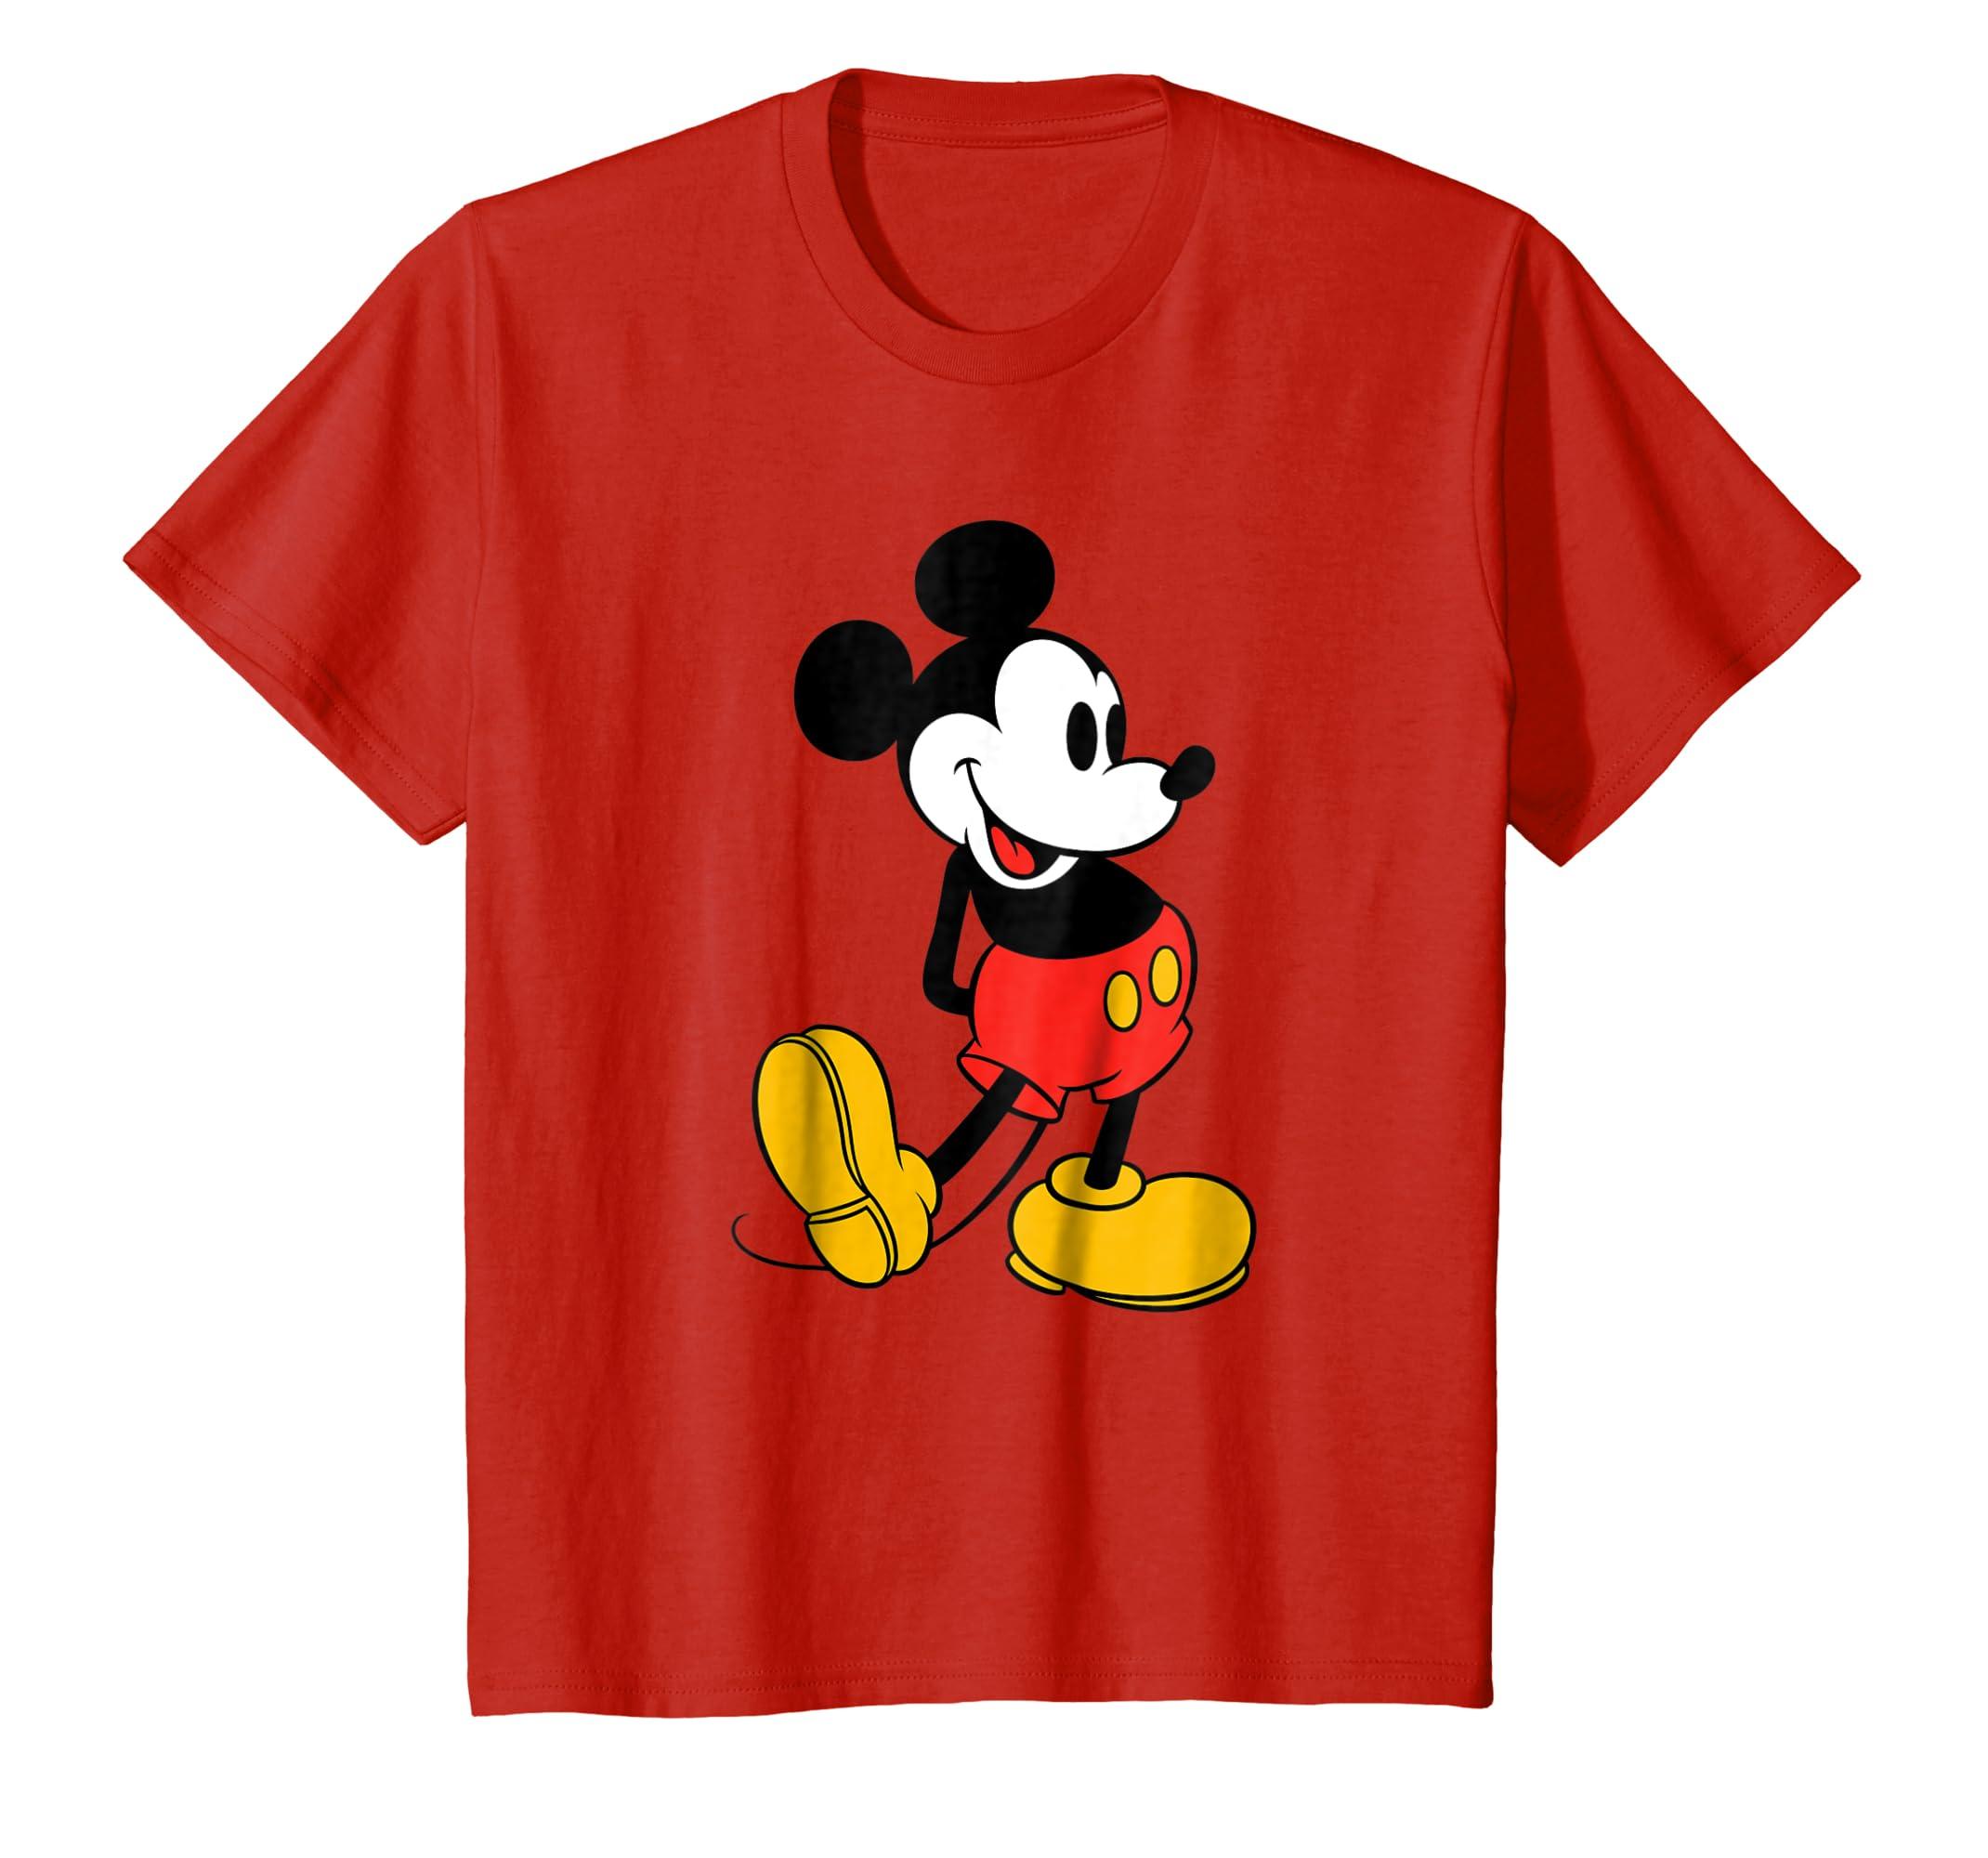 e1b8bbe274b Amazon.com  Disney Classic Mickey Mouse T-Shirt  Clothing